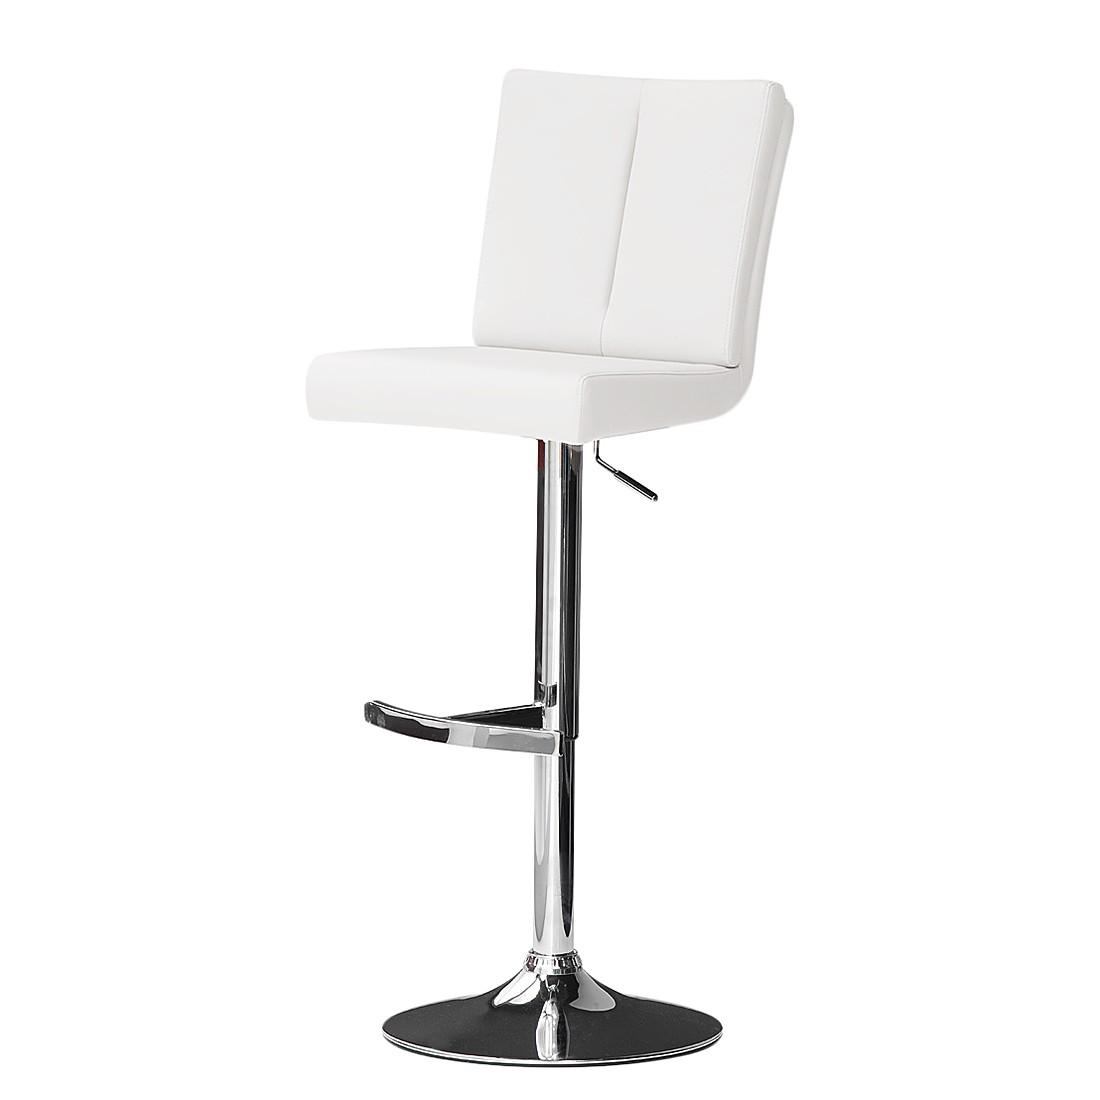 Barstuhl Jeremiah – Kunstleder – Weiß, roomscape jetzt kaufen